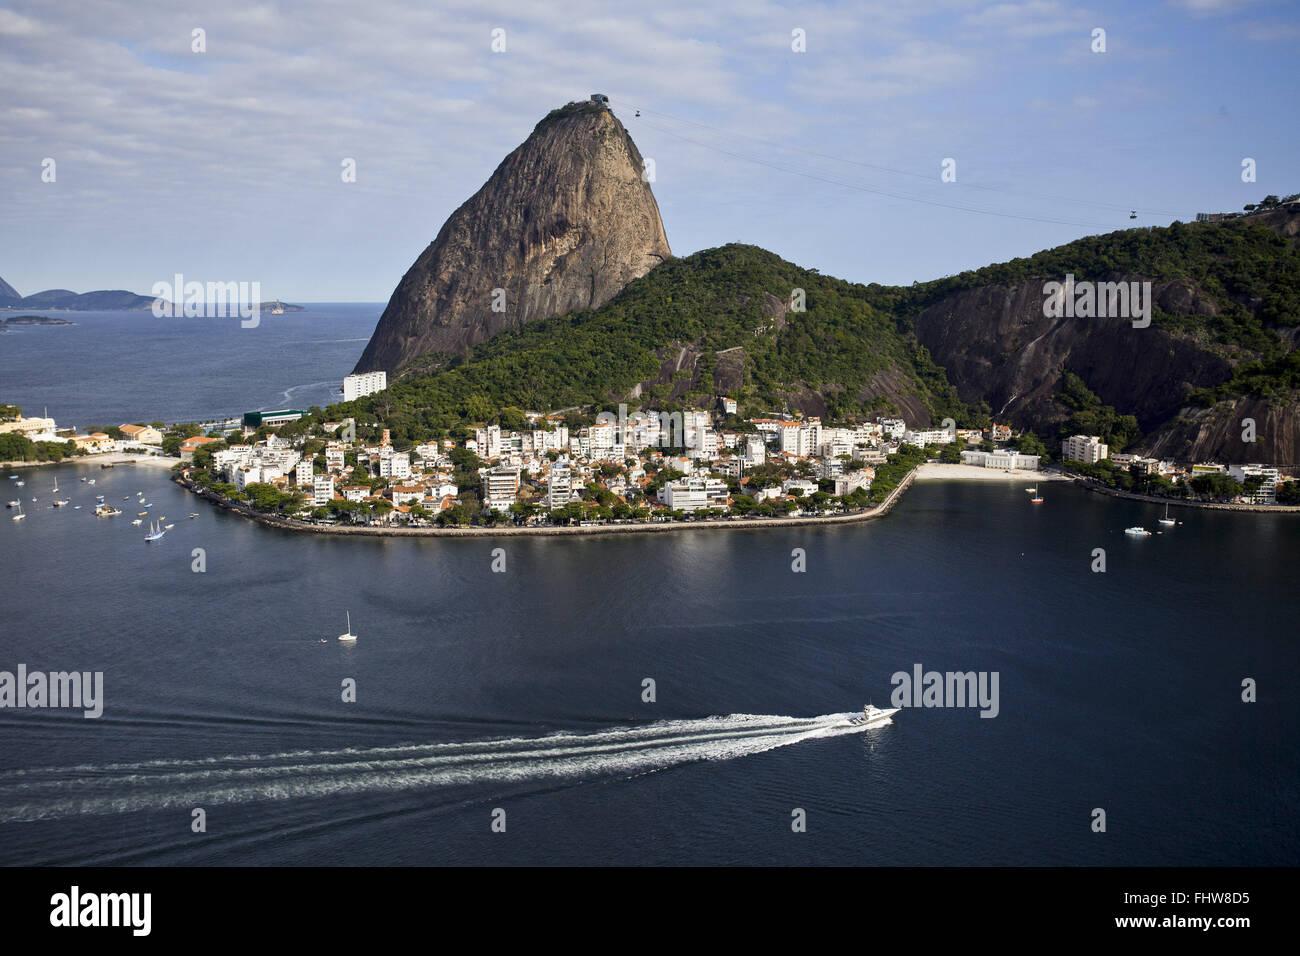 Aerial view of Sugar Loaf and Morro da Urca - Urca - southern city Stock Photo